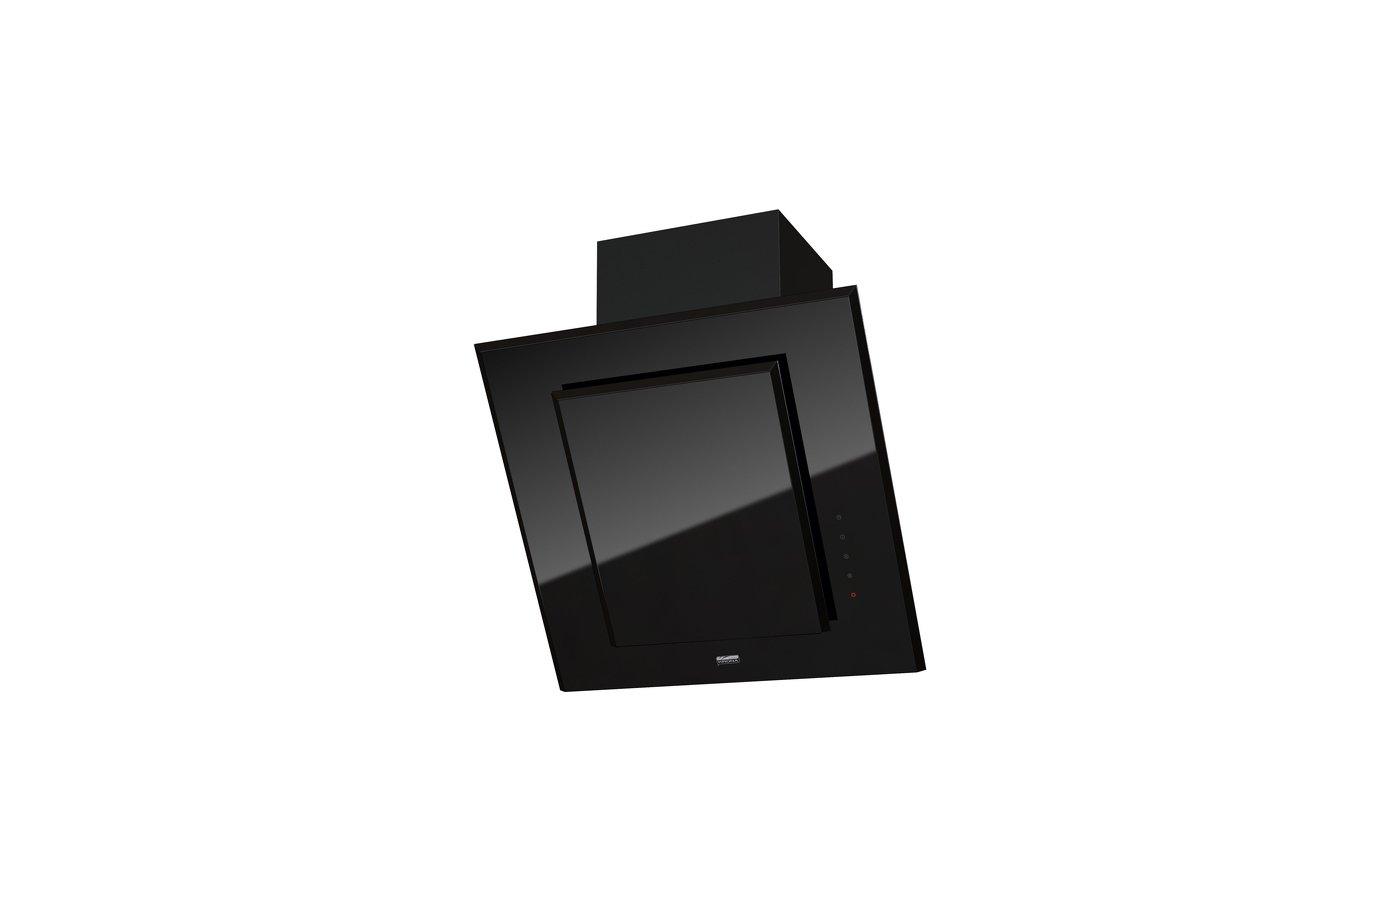 Вытяжка KRONA NATALI 600 BLACK 3P-S